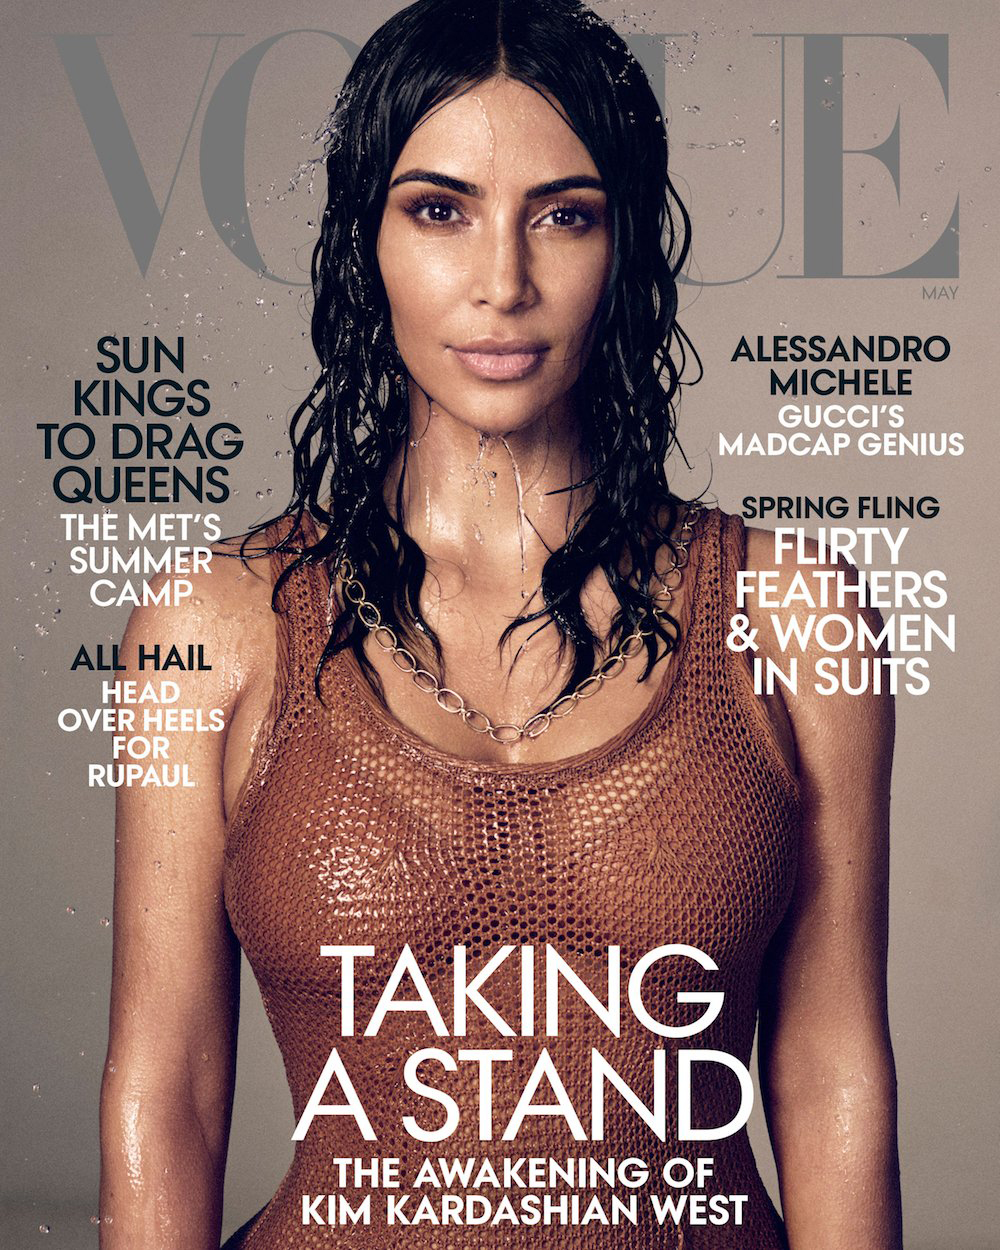 Kim-Kardashian-May-2019-Vogue-Cover